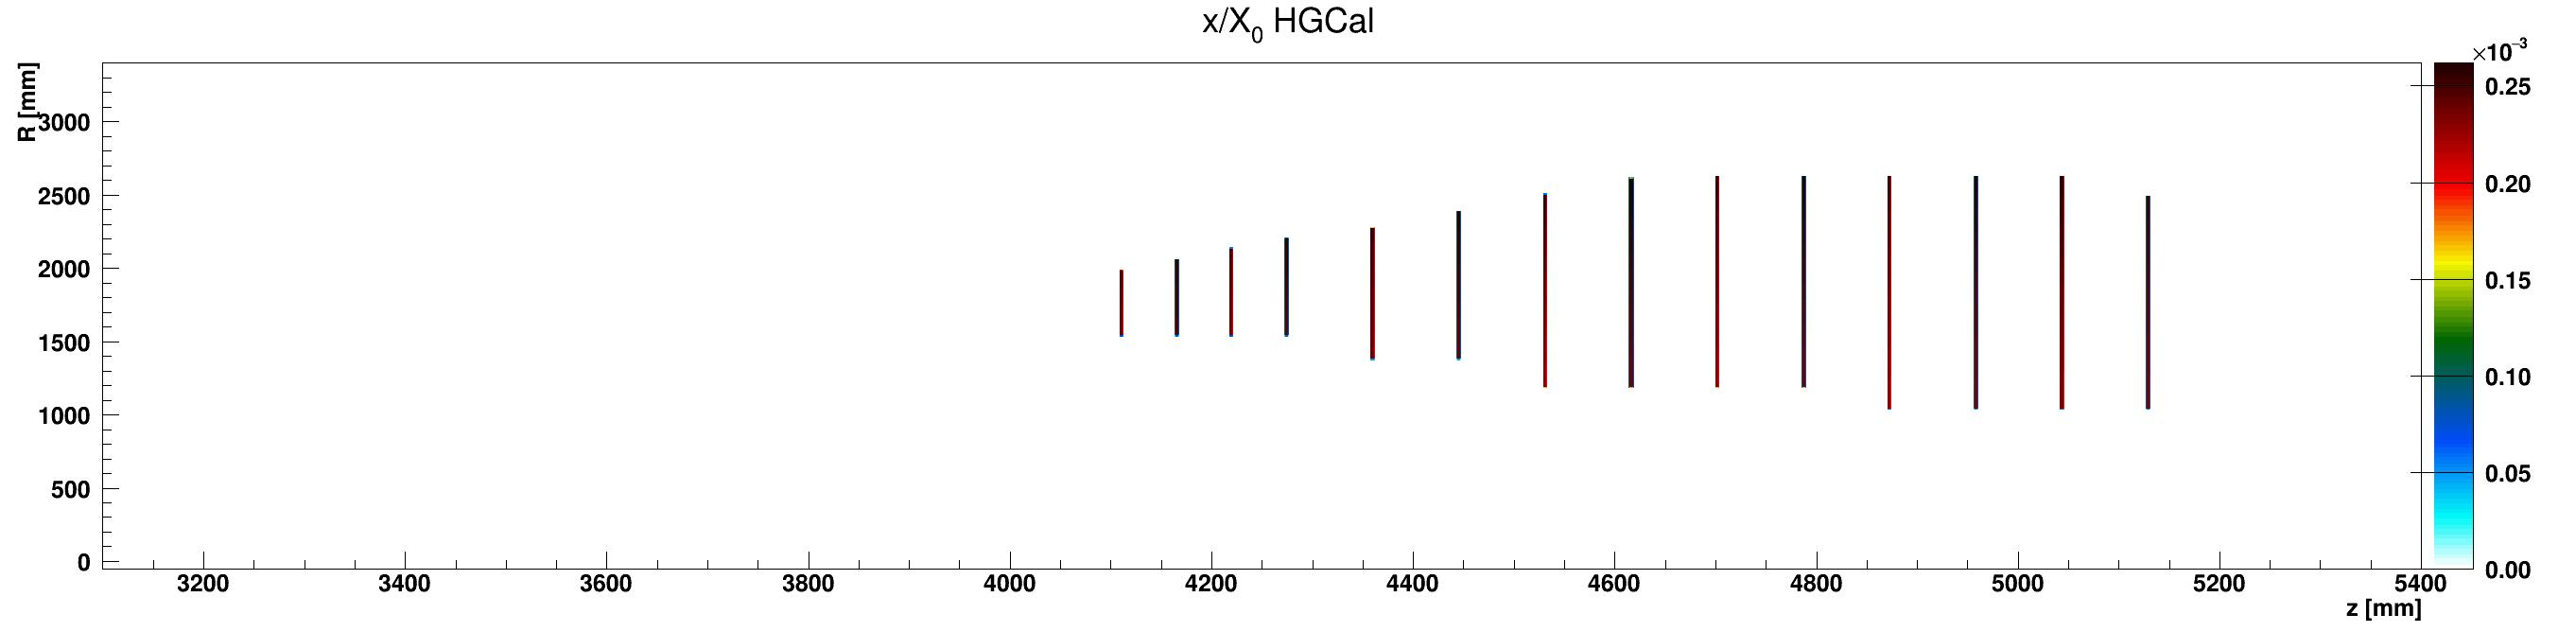 HGCal_x_vs_z_vs_RlocScintillator_ZplusZoom.png